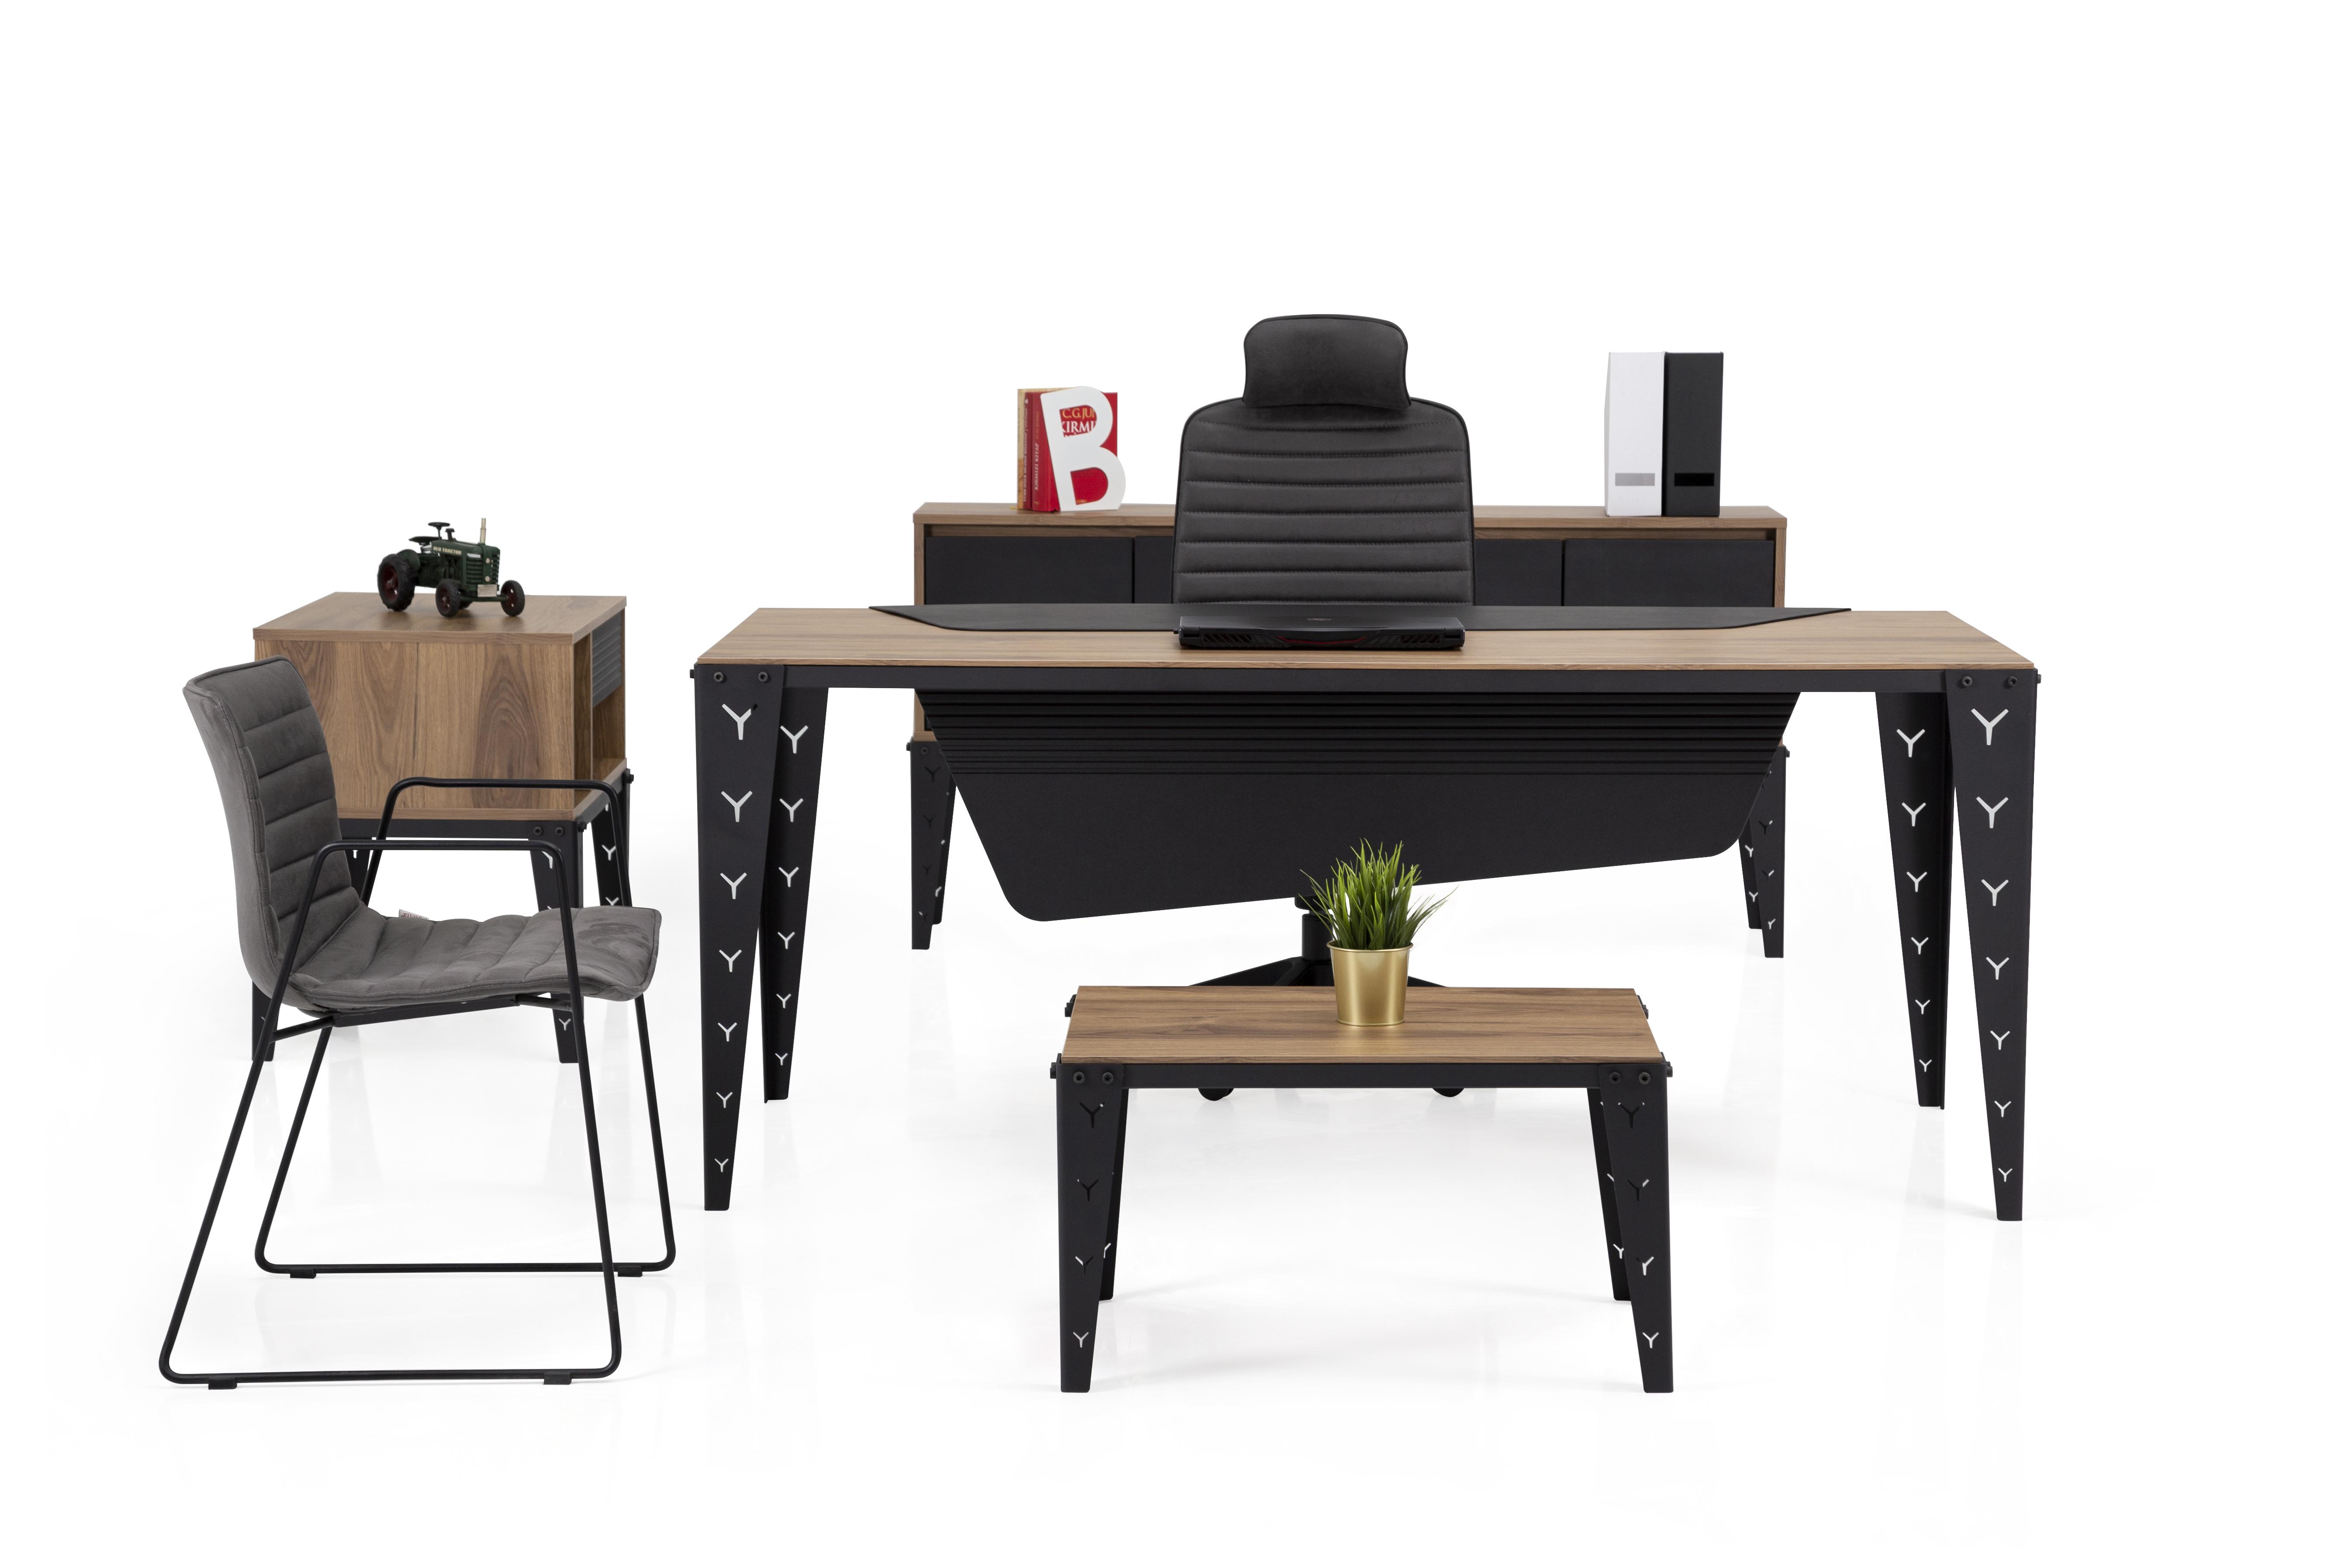 Ovali Büromöbel komplett 4-teilig Mustang 200x90 cm